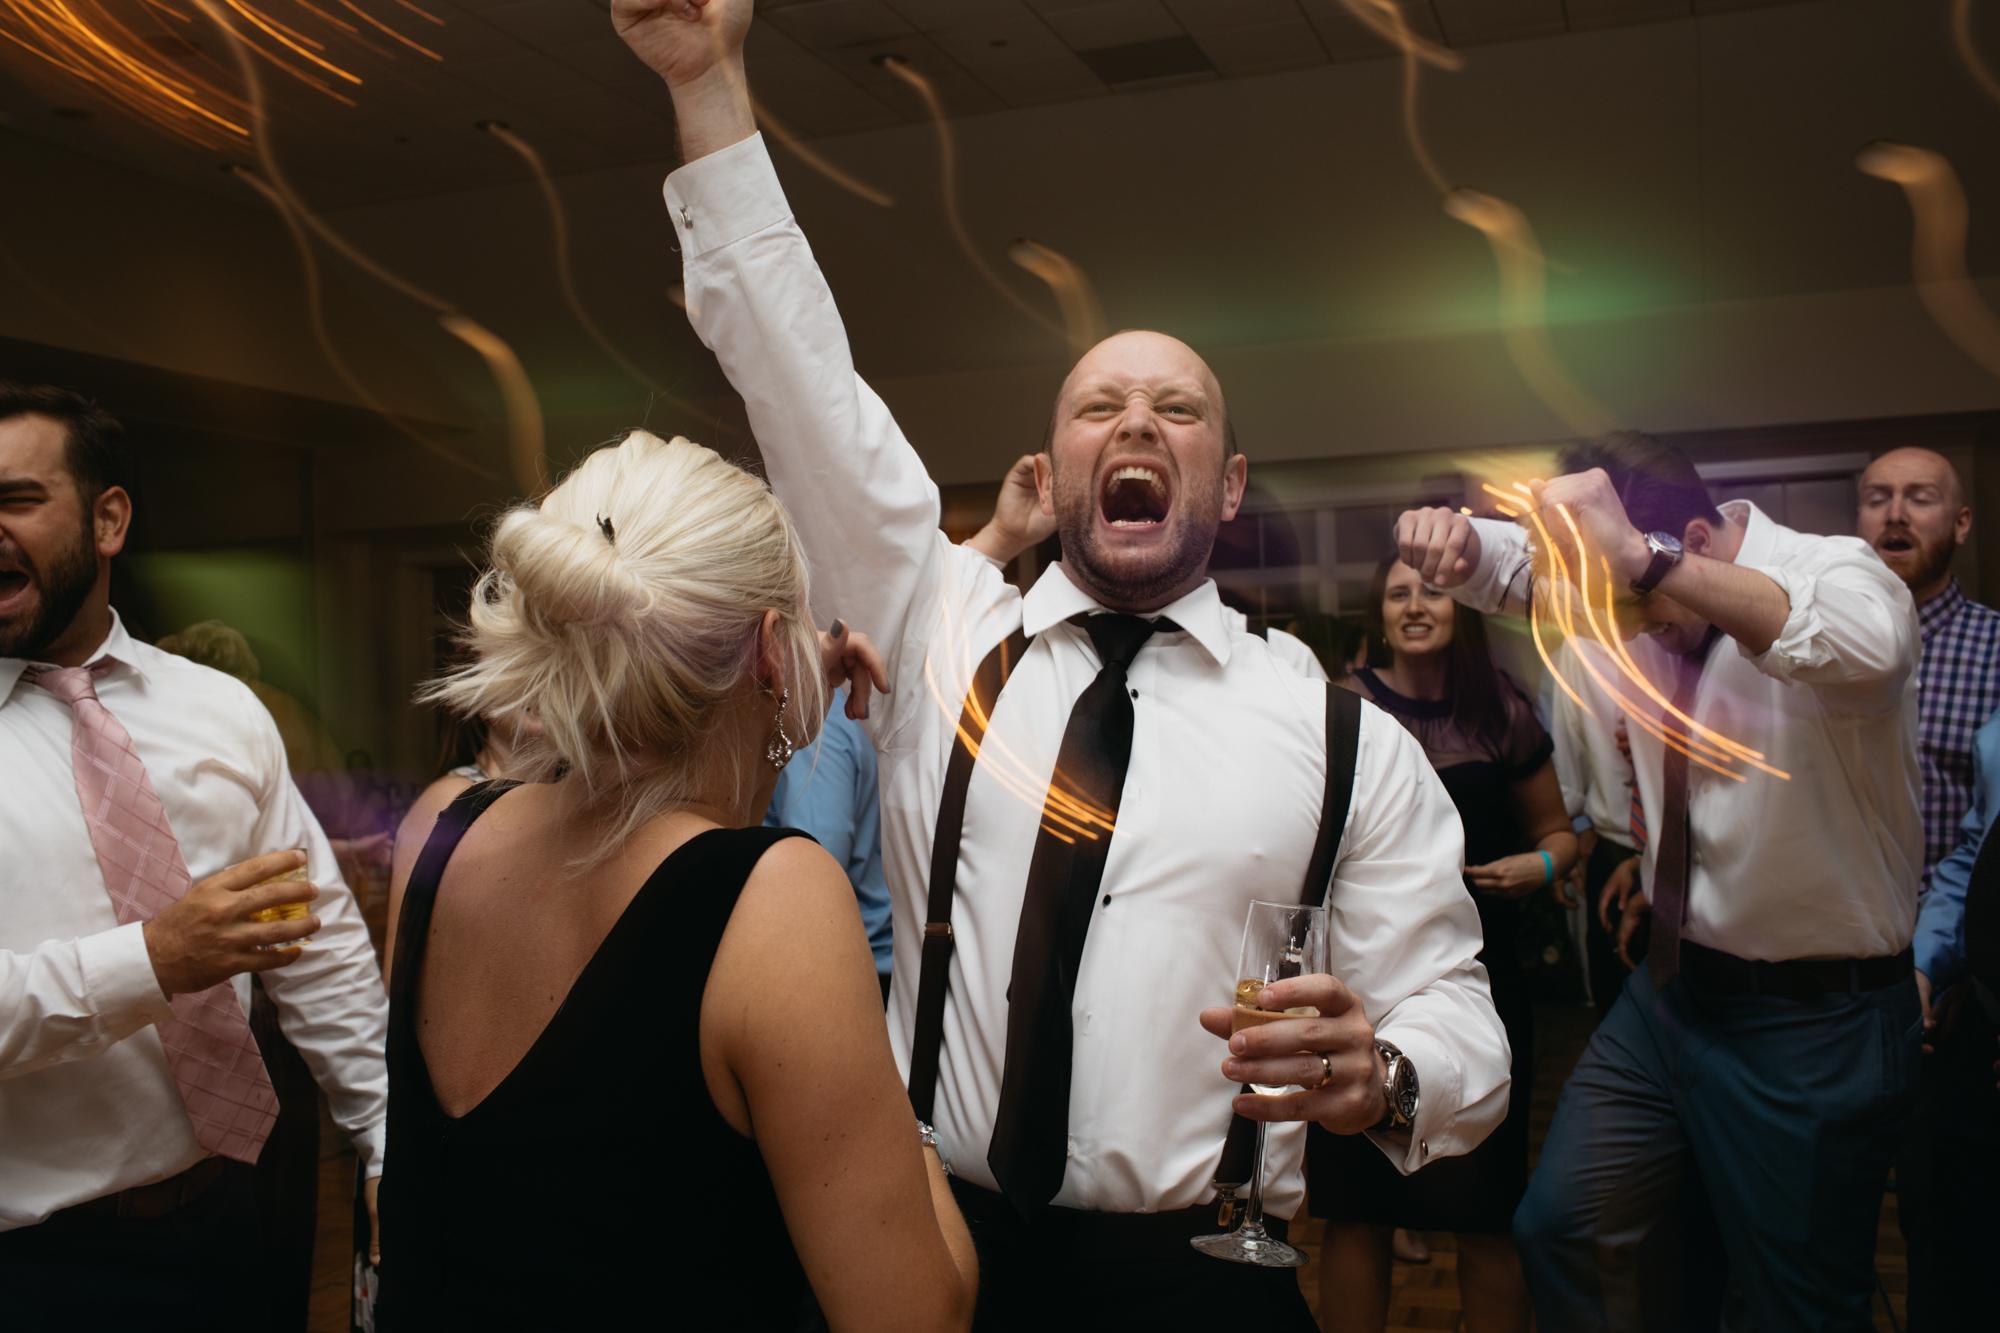 Jaclyn_Andrew_quincy_massachusetts_wedding037.jpg